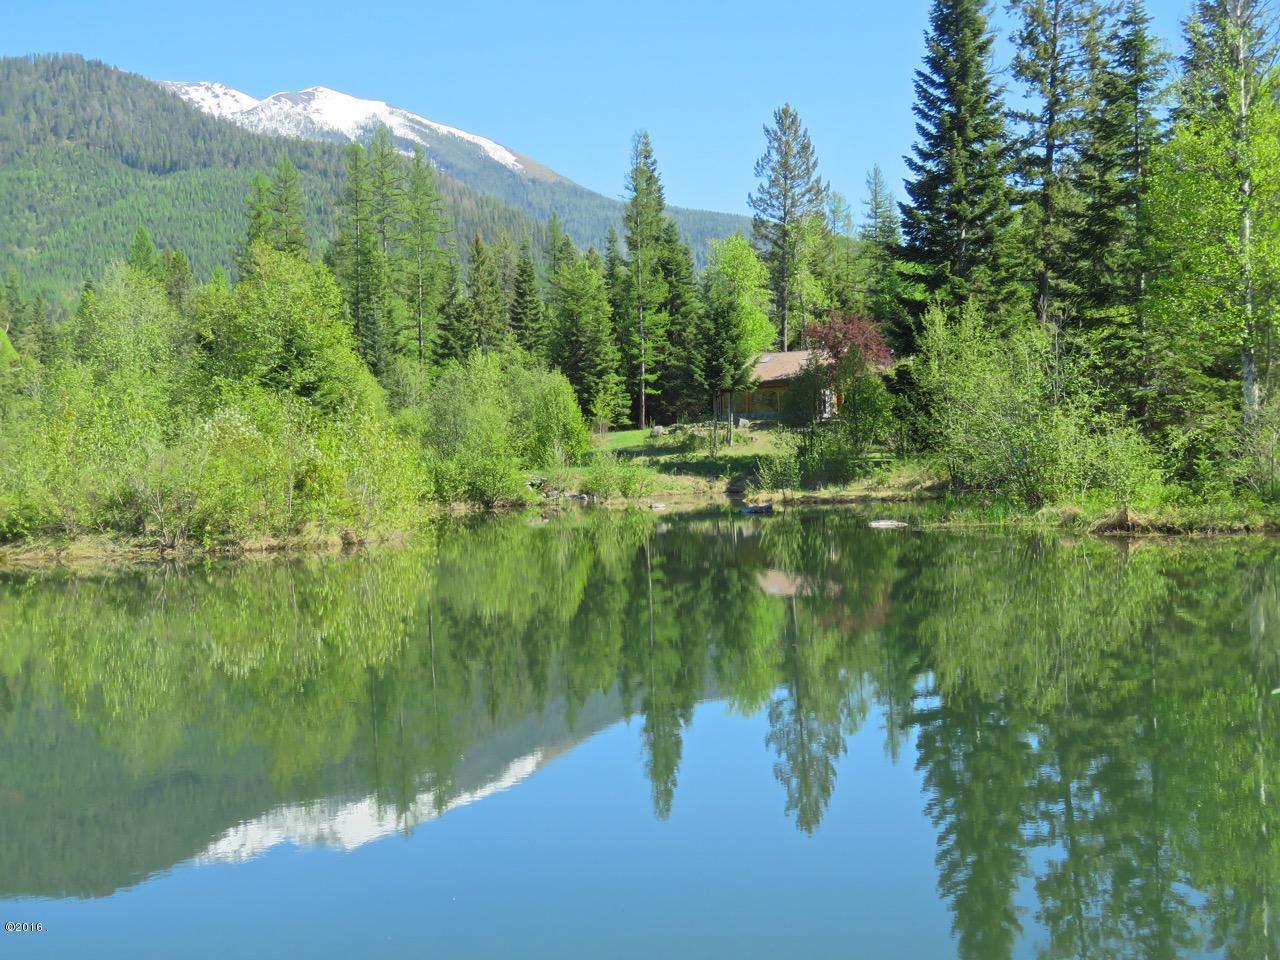 Single Family Home for Sale at 450 Landmark Lane Bigfork, Montana 59911 United States